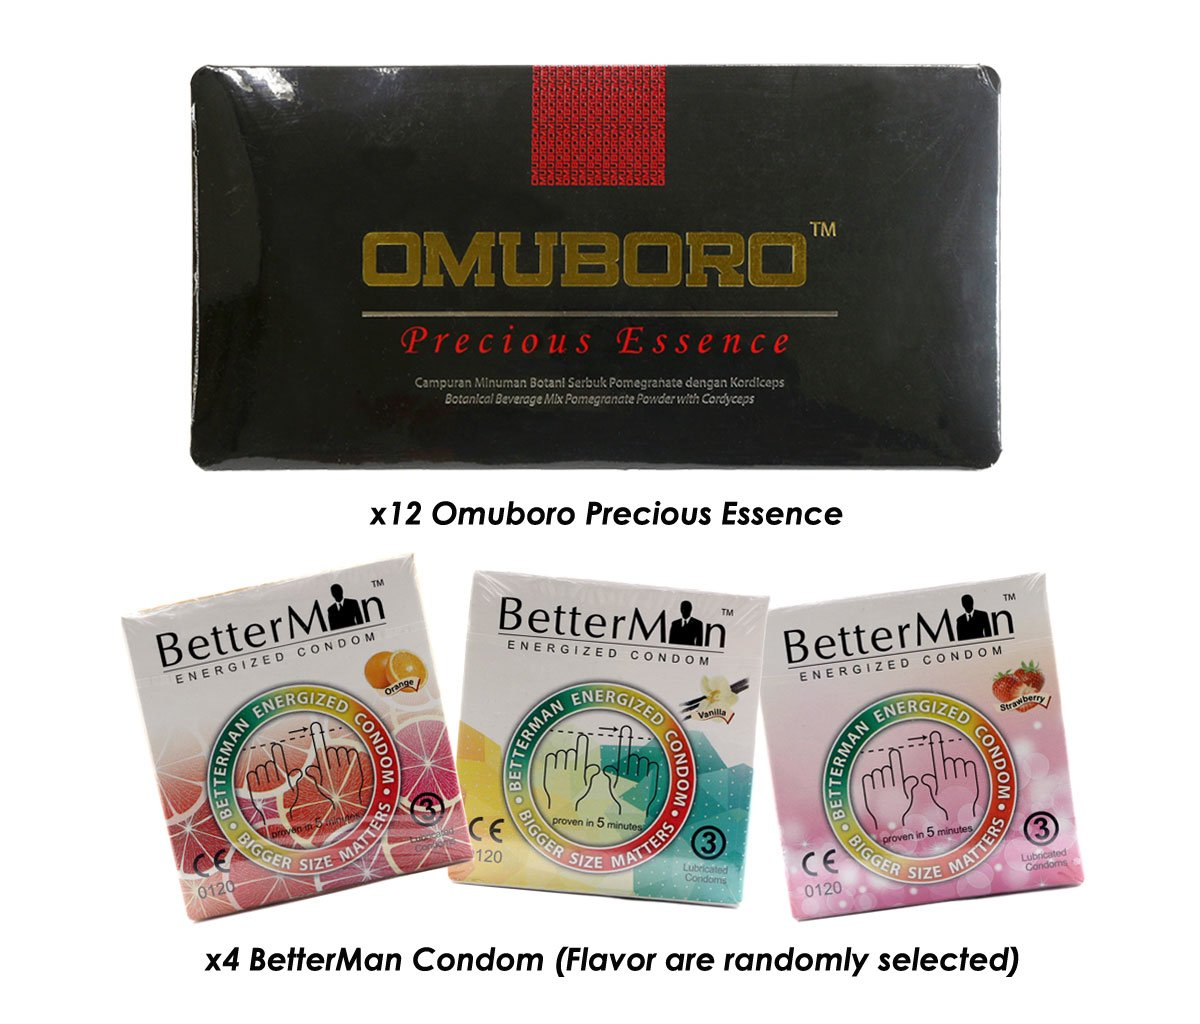 (12) Pack Omuboro Precious Essence Longer Erection & Improve Male Health Perfomance + Free (4) Box BetterMan Anion Condom with OxyPlus formula